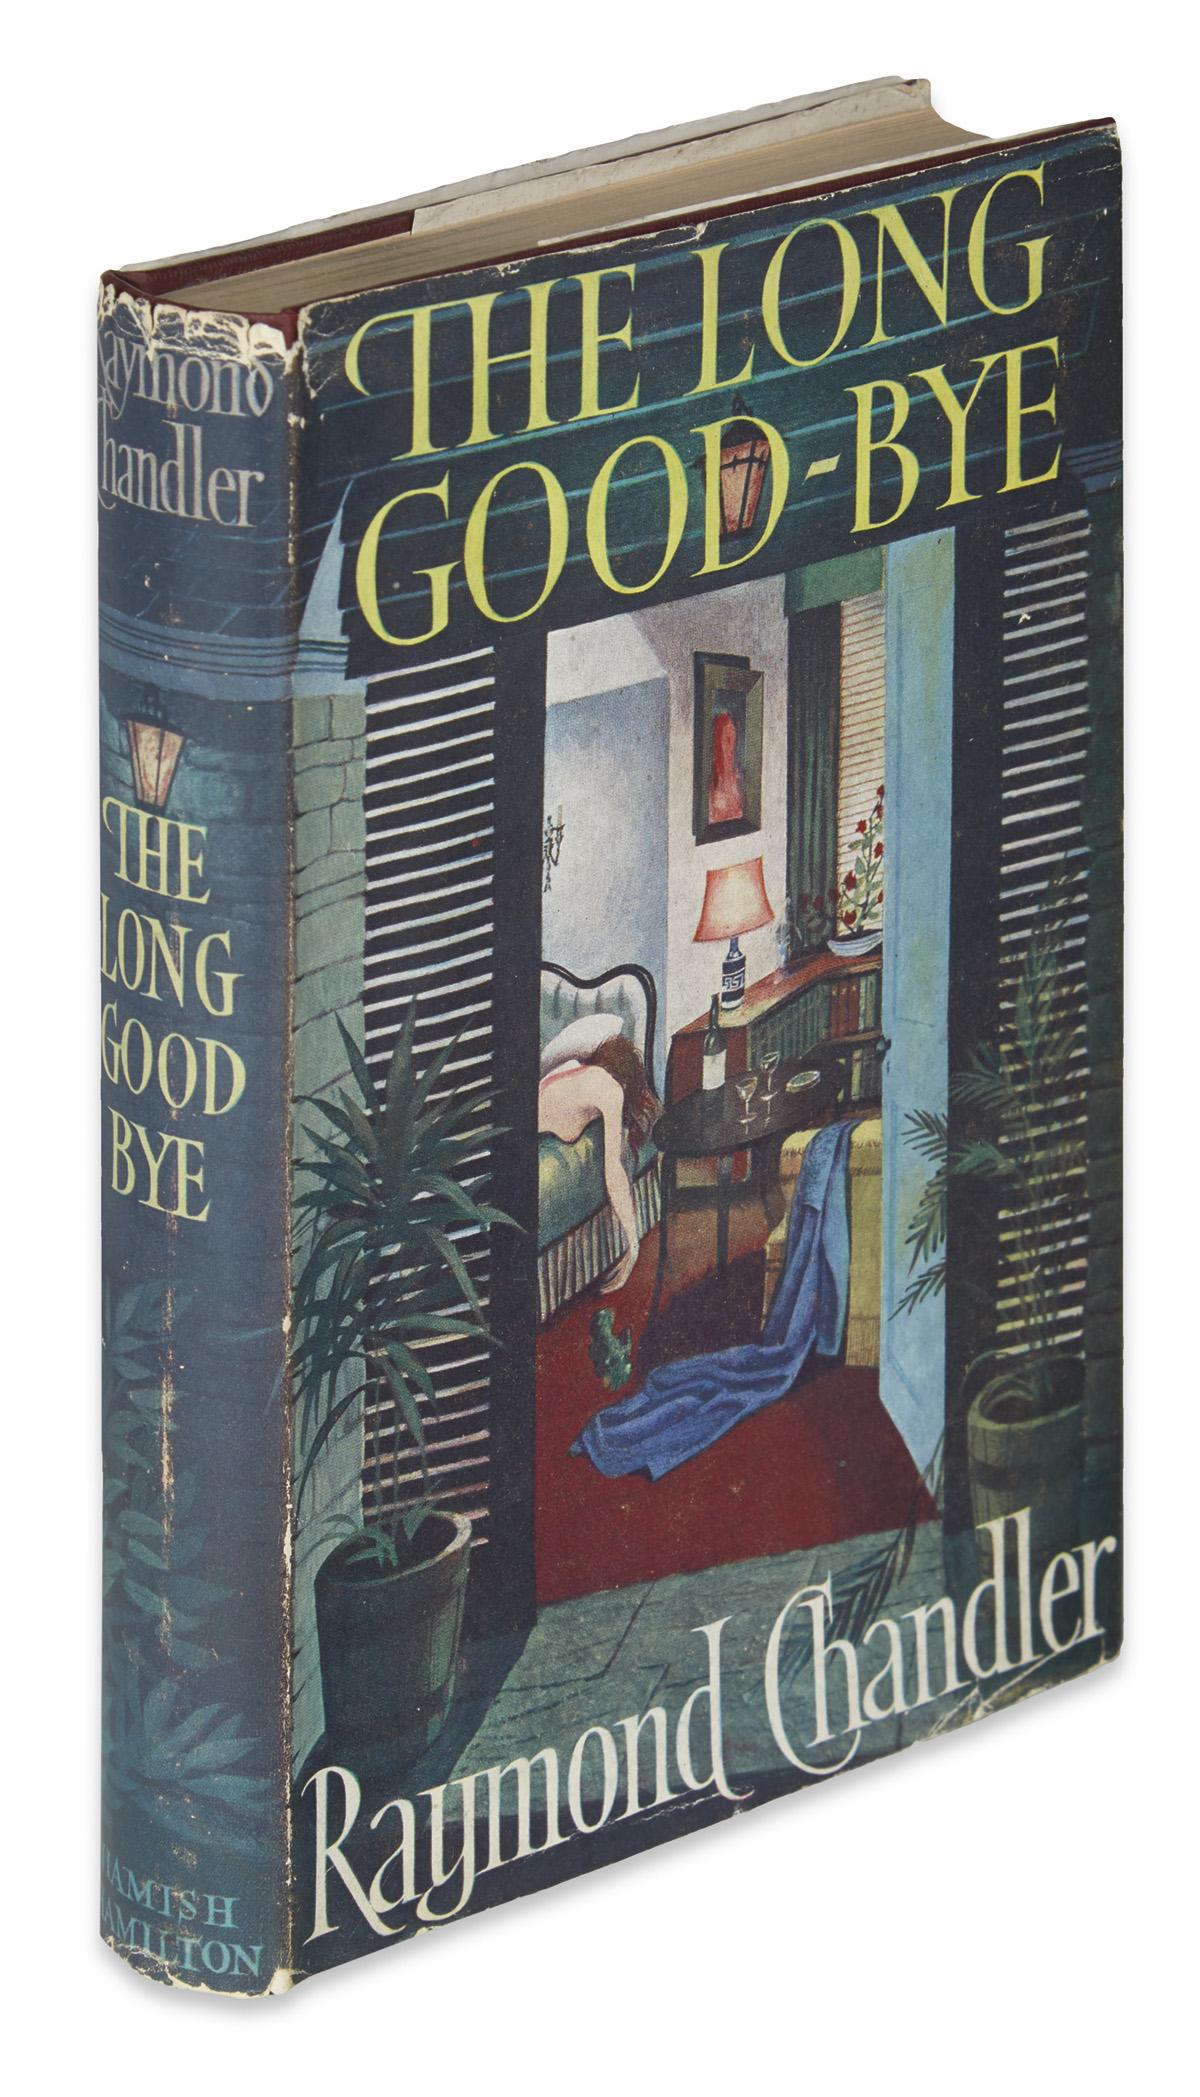 CHANDLER-RAYMOND-The-Long-Good-bye